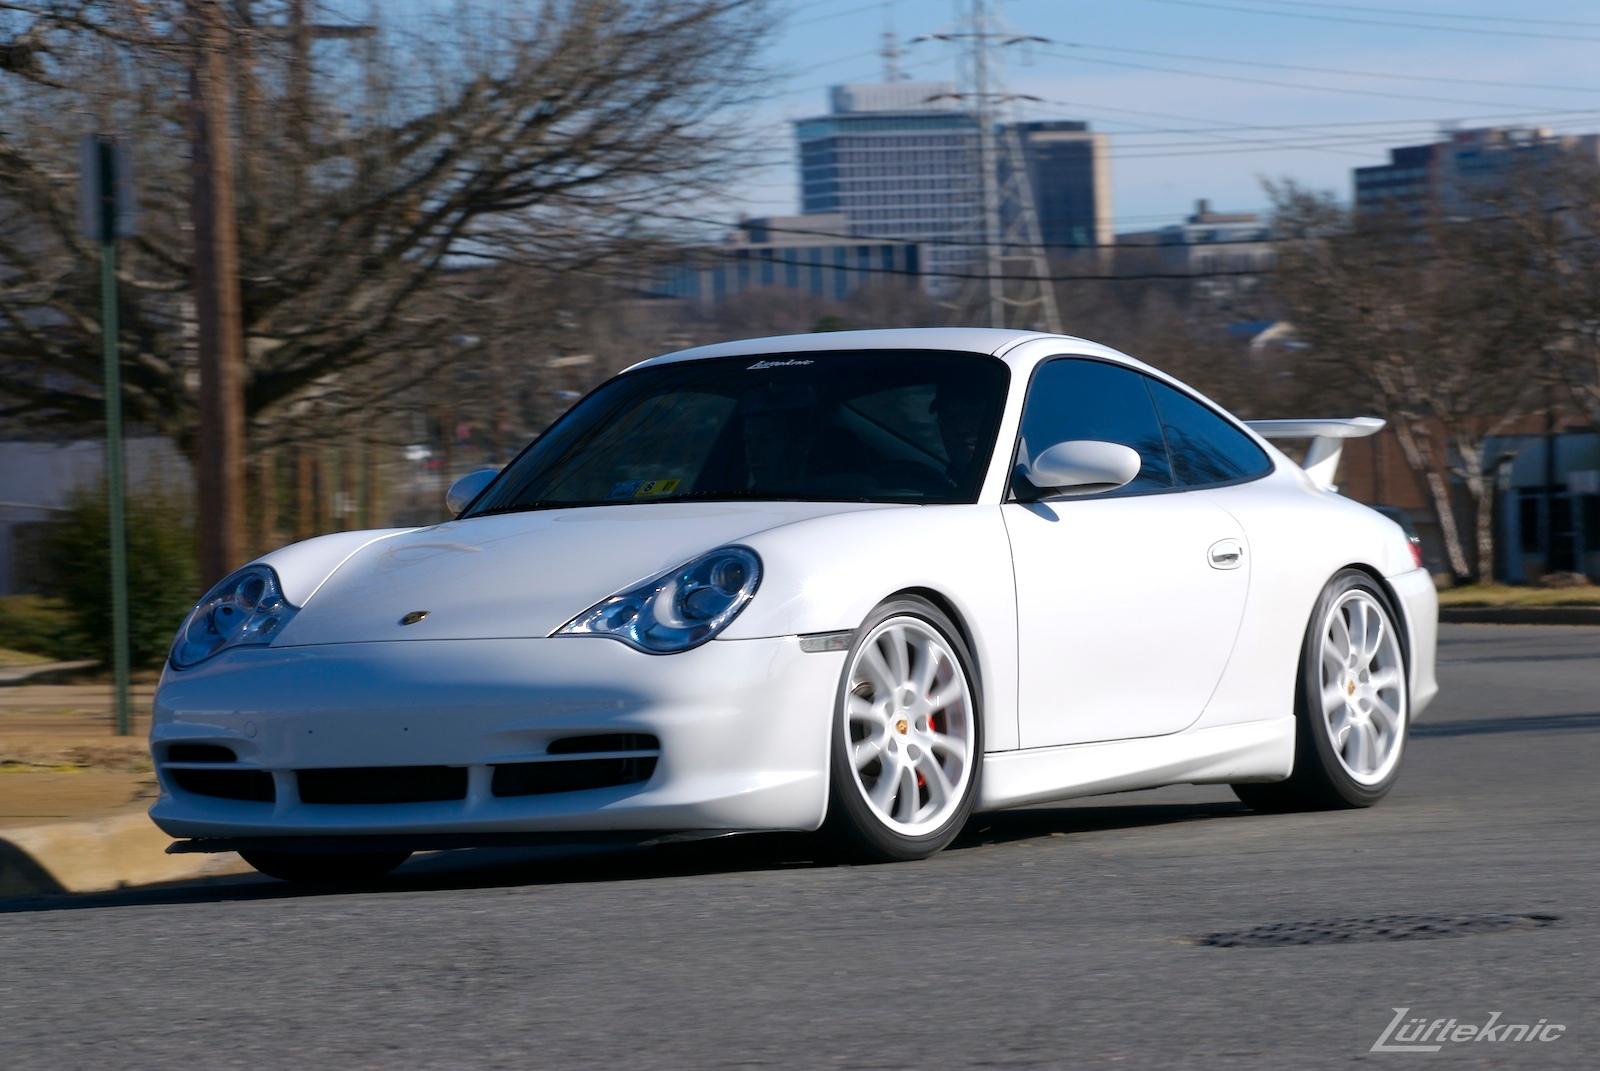 A track-prepped white Porsche 996 Gt3.